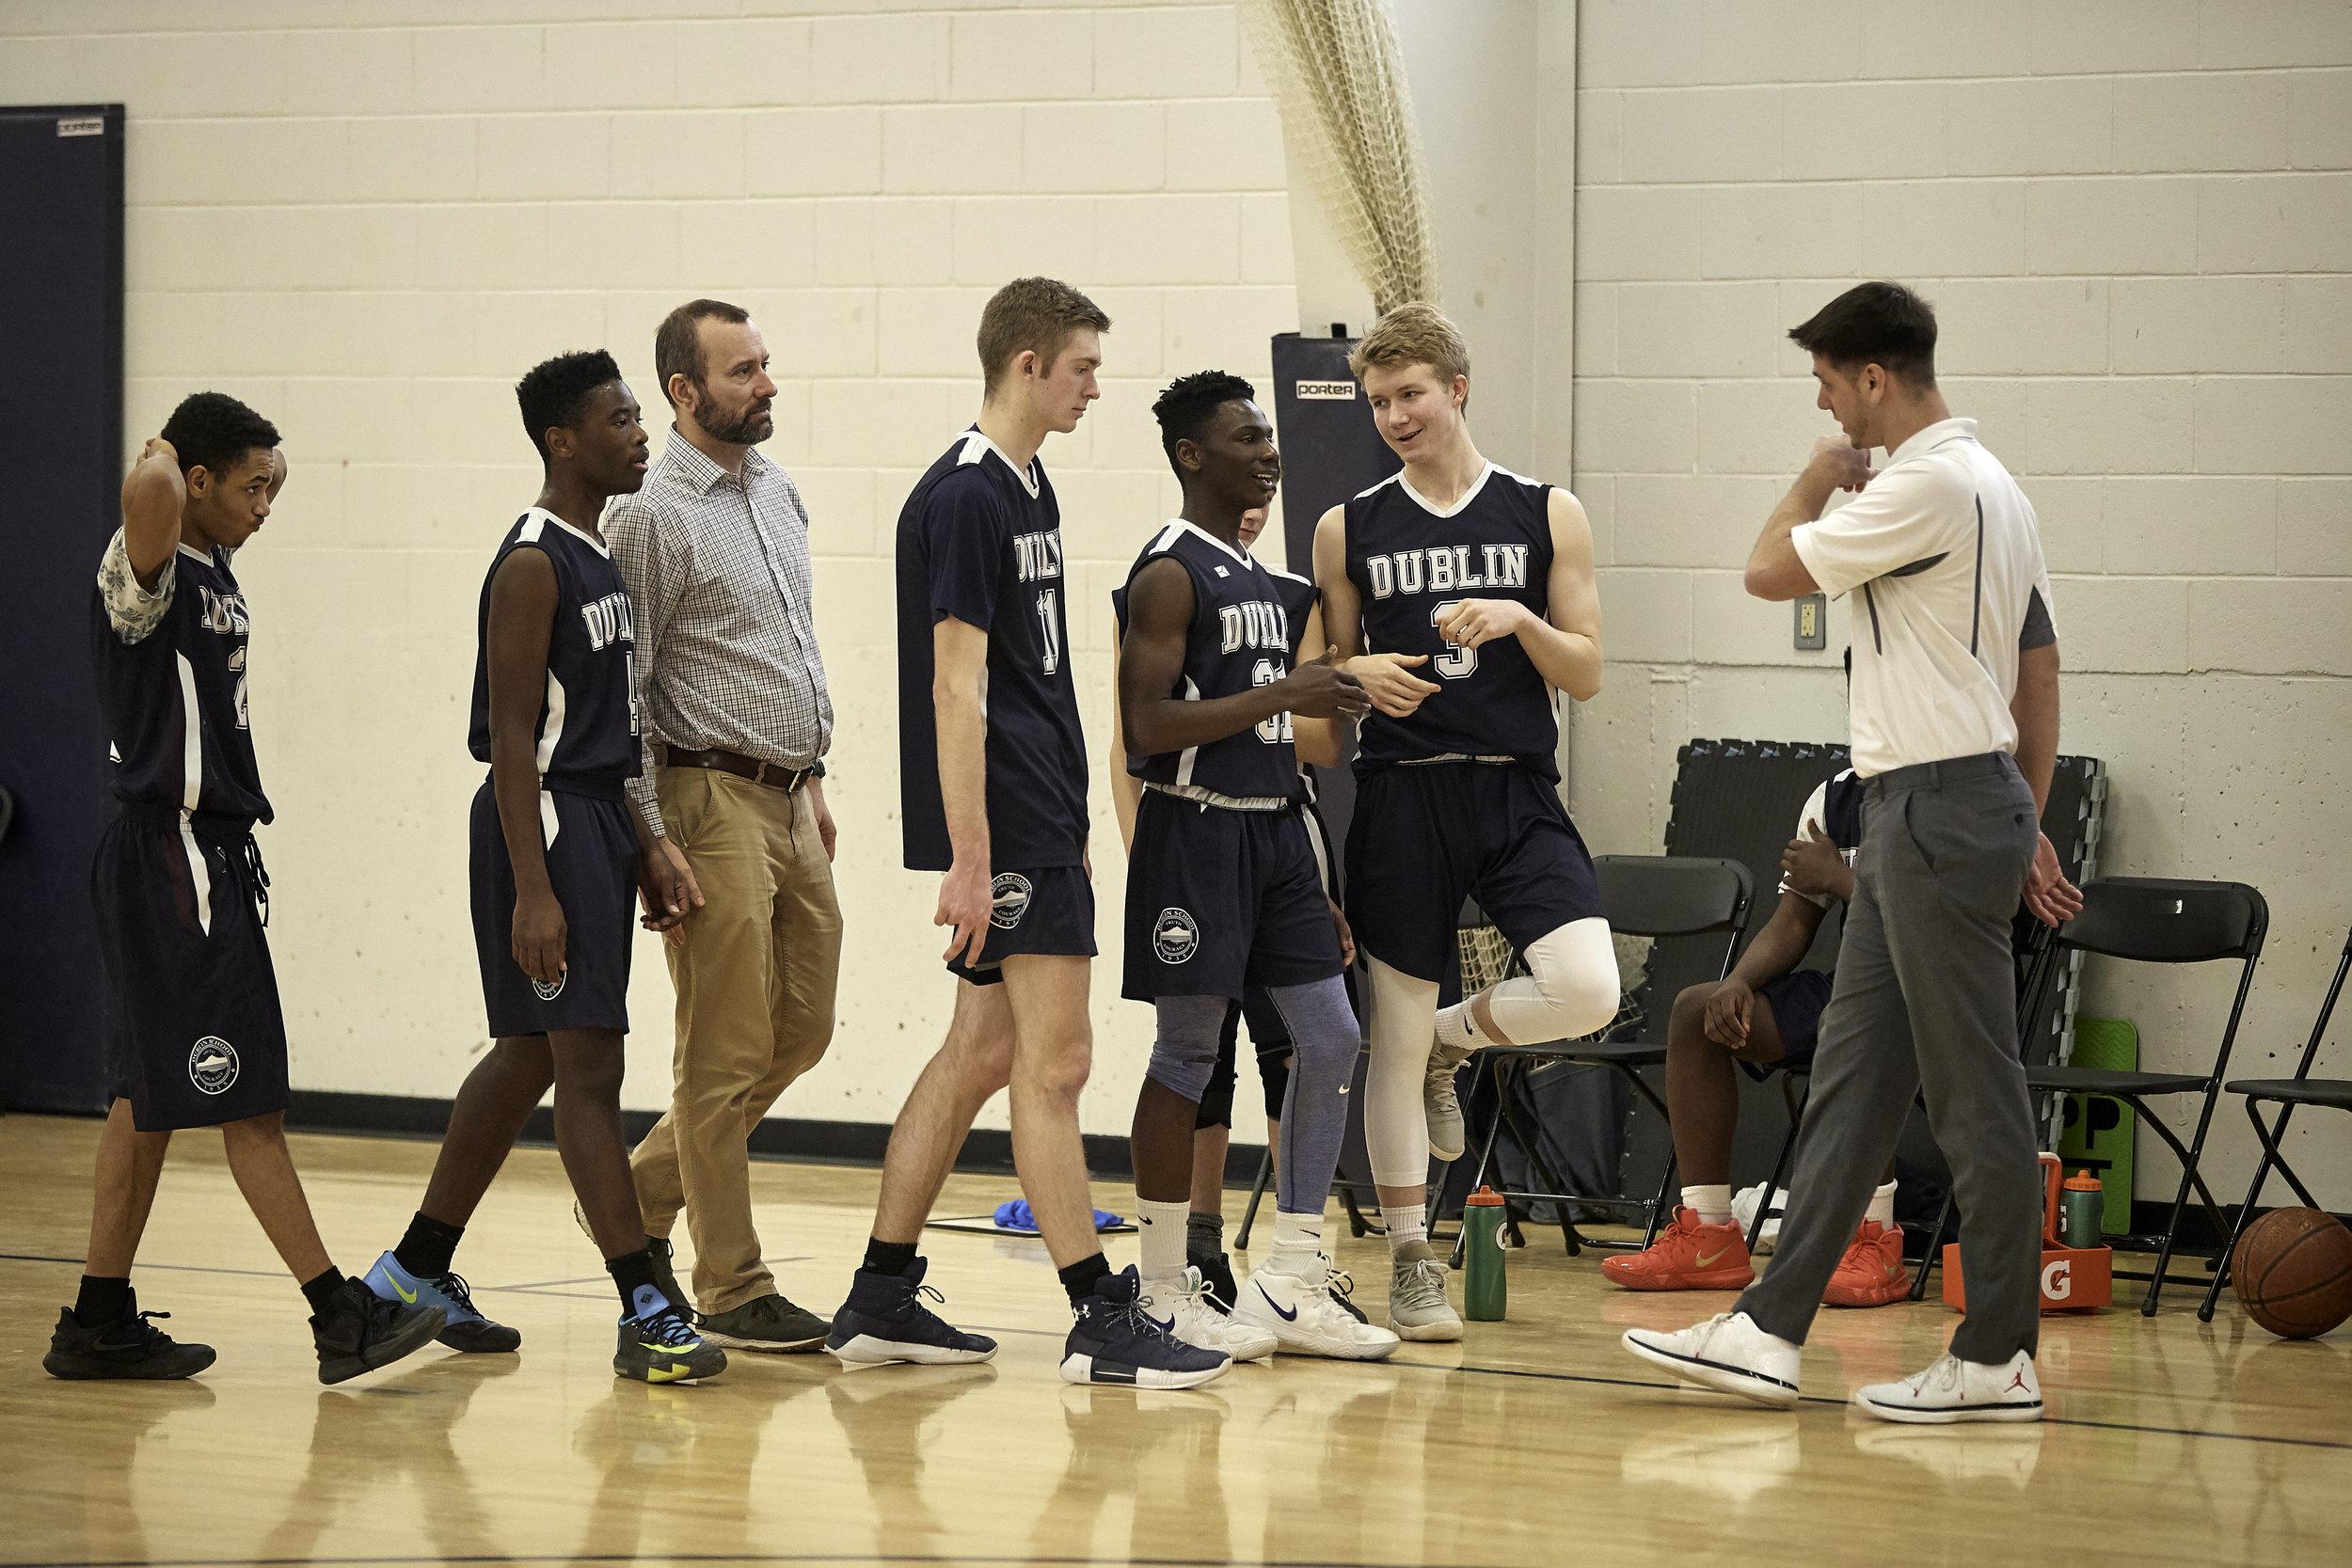 Boys Varsity Basketball vs High Mowing School - Feb 02 2019 - 0097.jpg